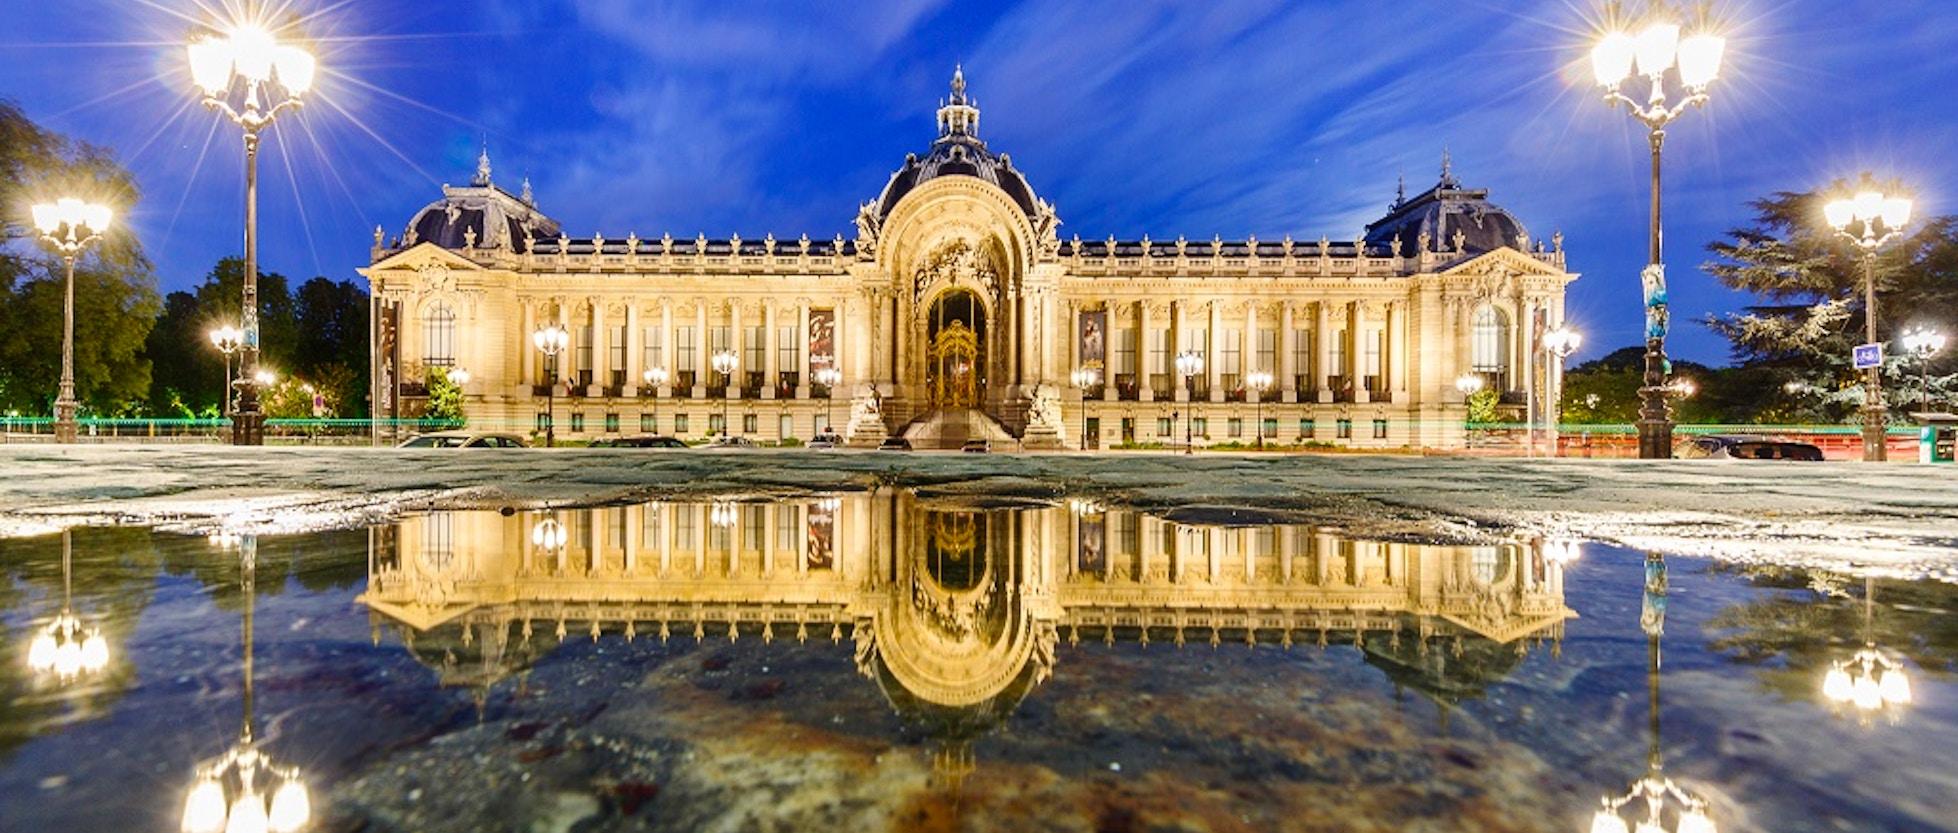 Petit palais il museo delle belle arti di parigi vivi for Architettura a parigi